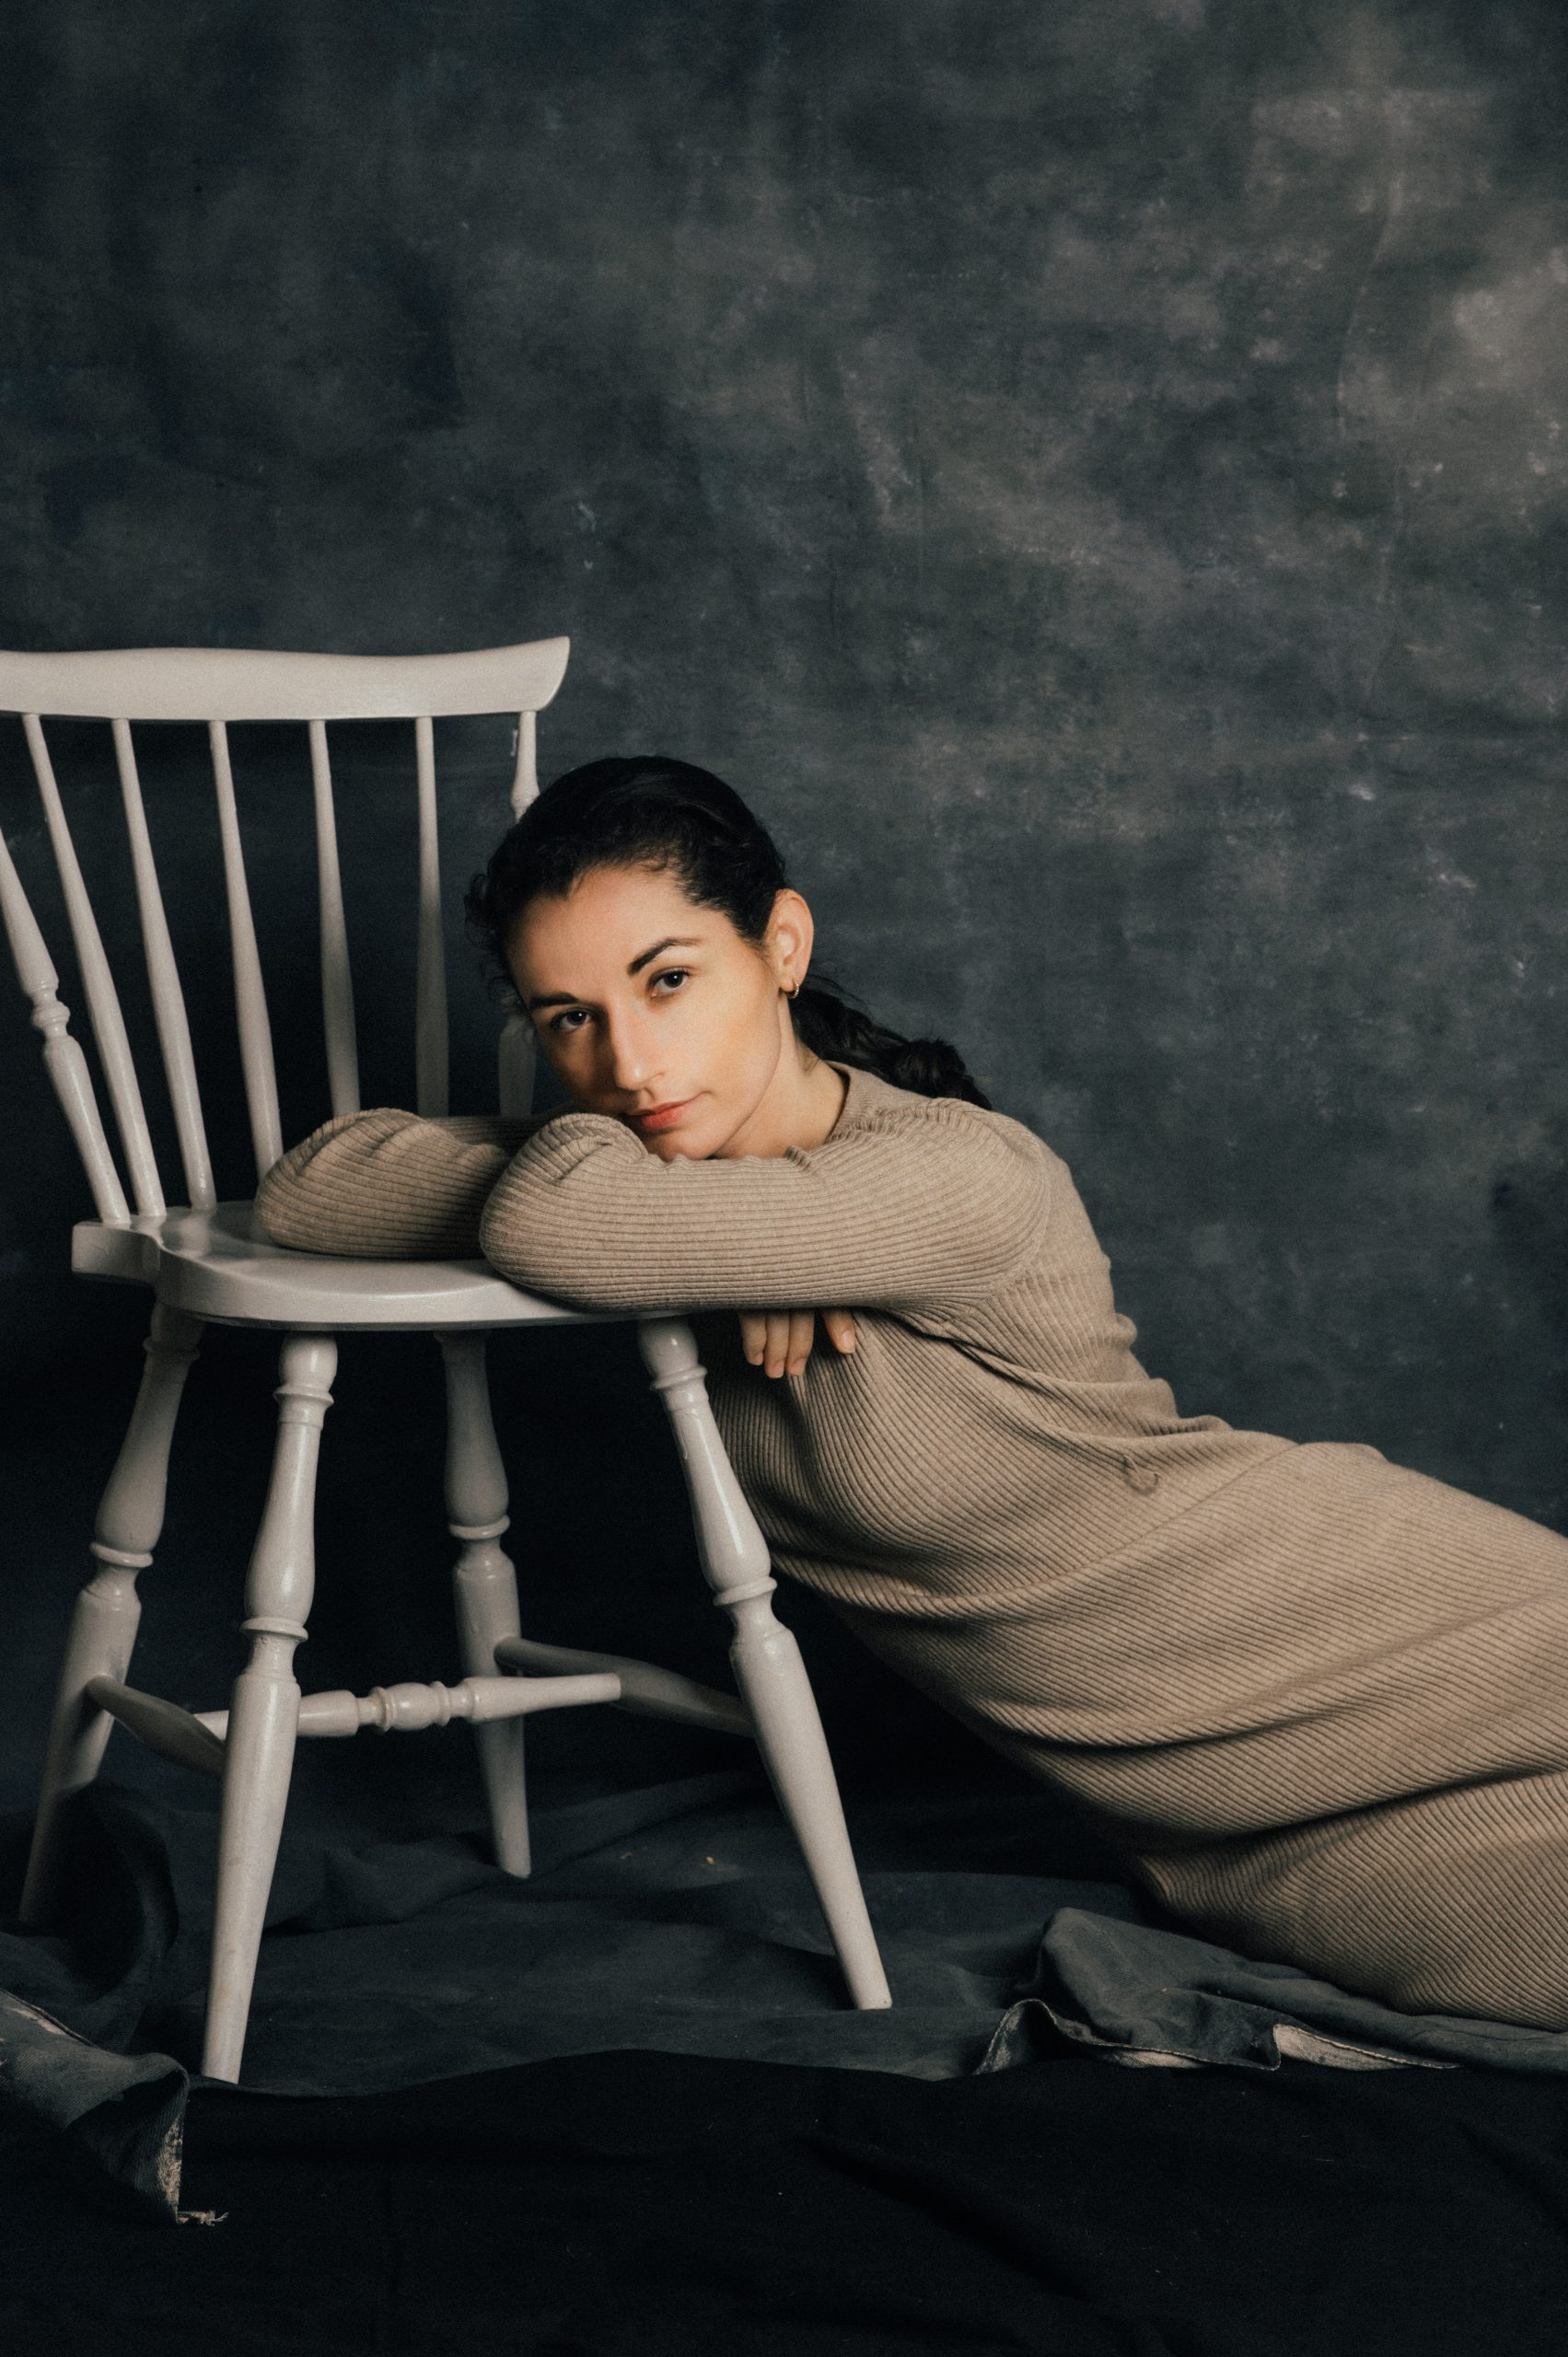 Frau liegt neben weißem Stuhl